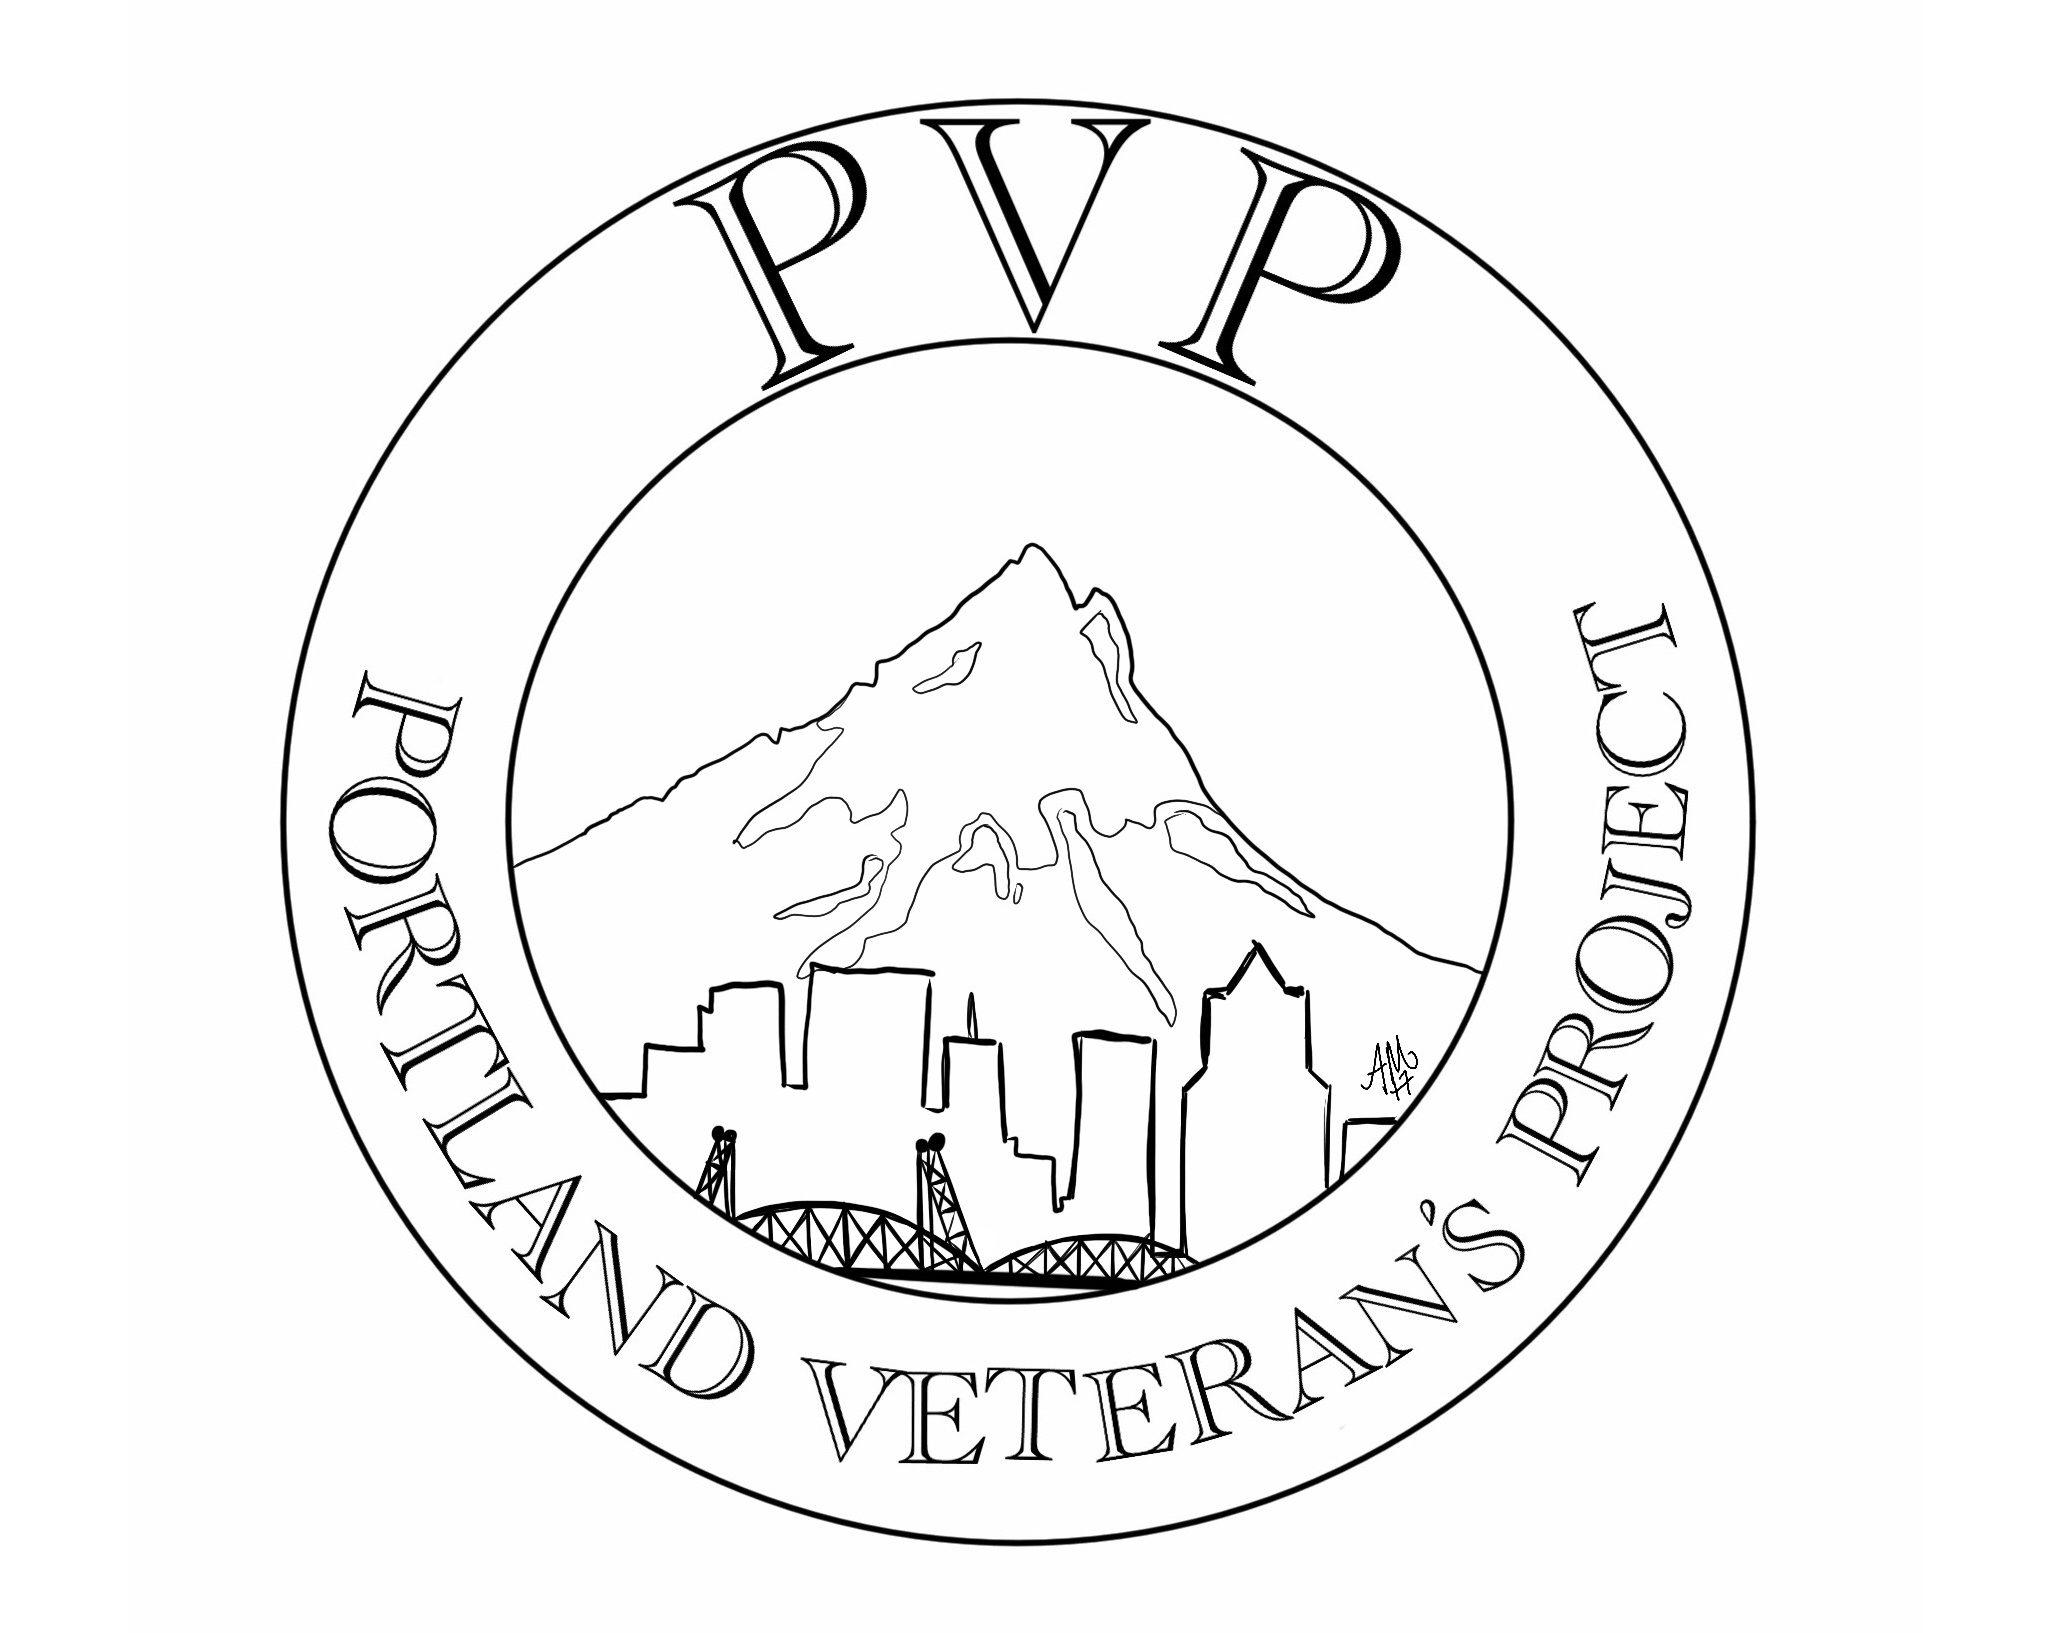 Portland Veteran's Project